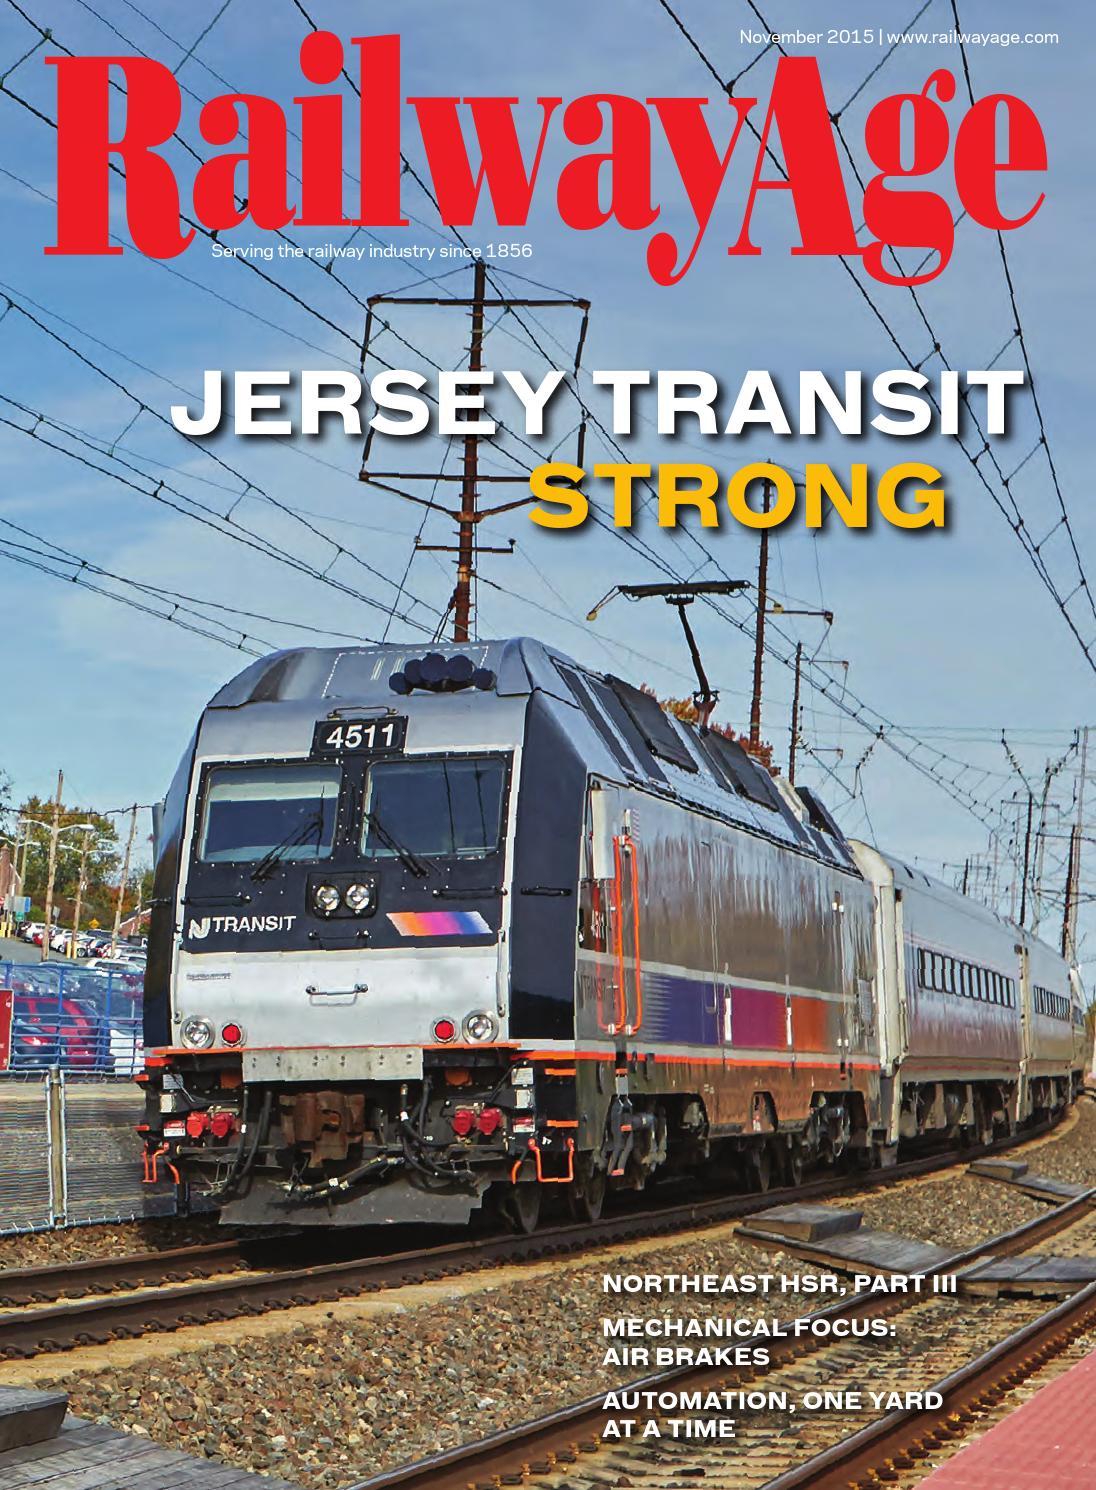 November 2015 Railway Age by Railway Age - issuu